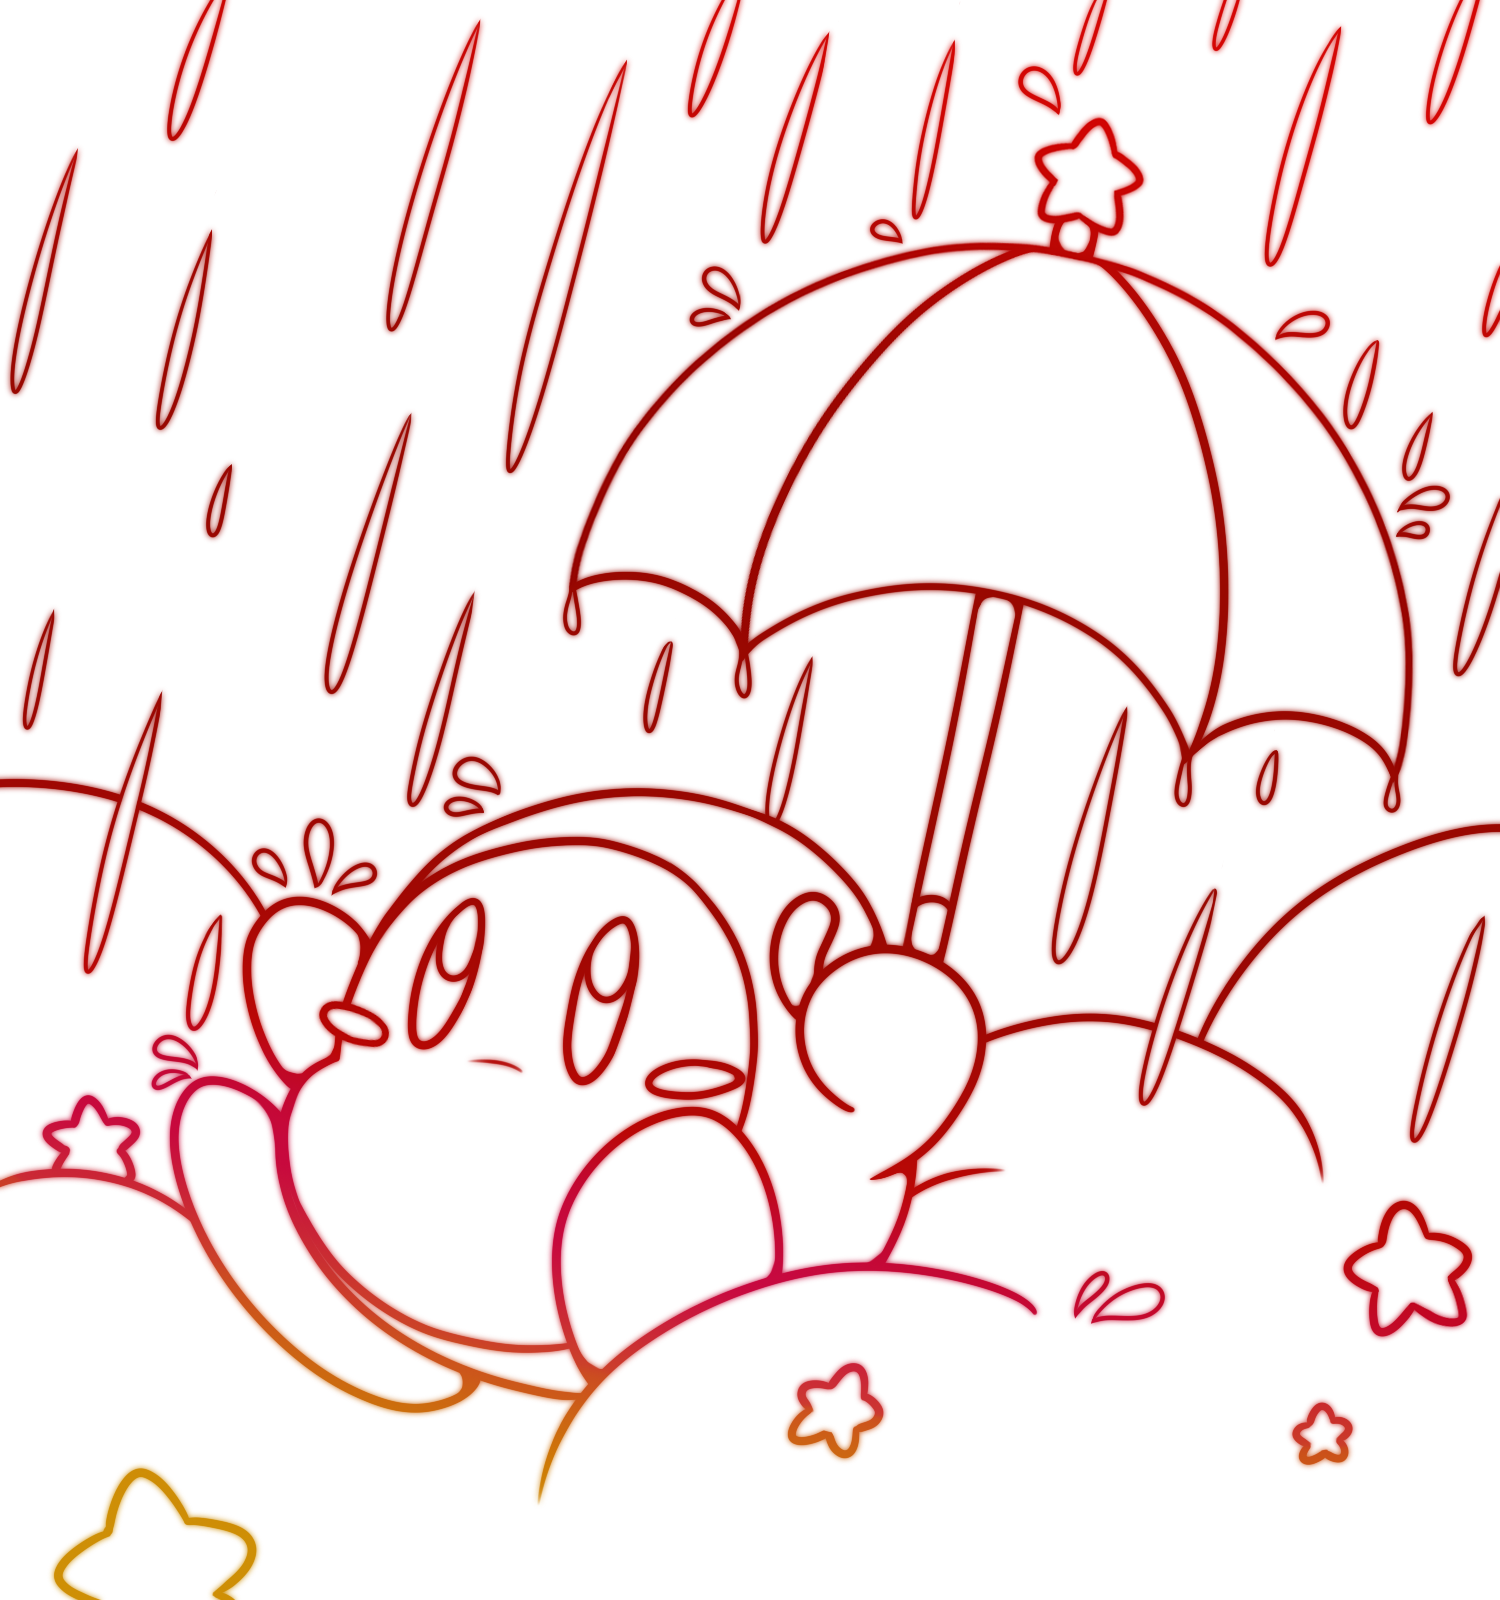 [prize art] rainy dee by Electrosa